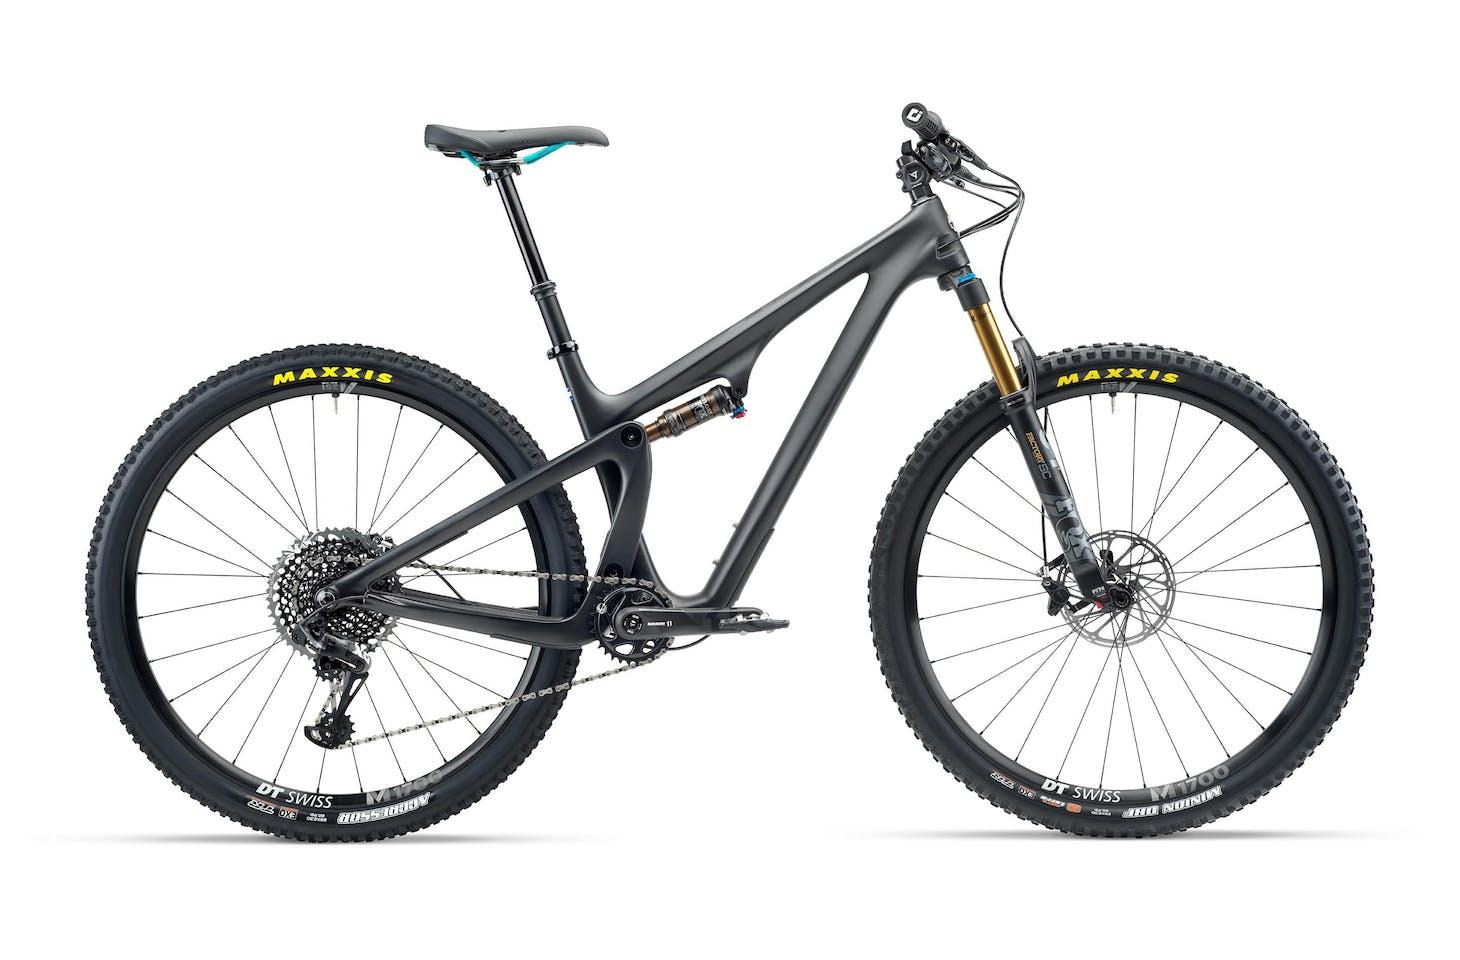 Yeti bike model SB100